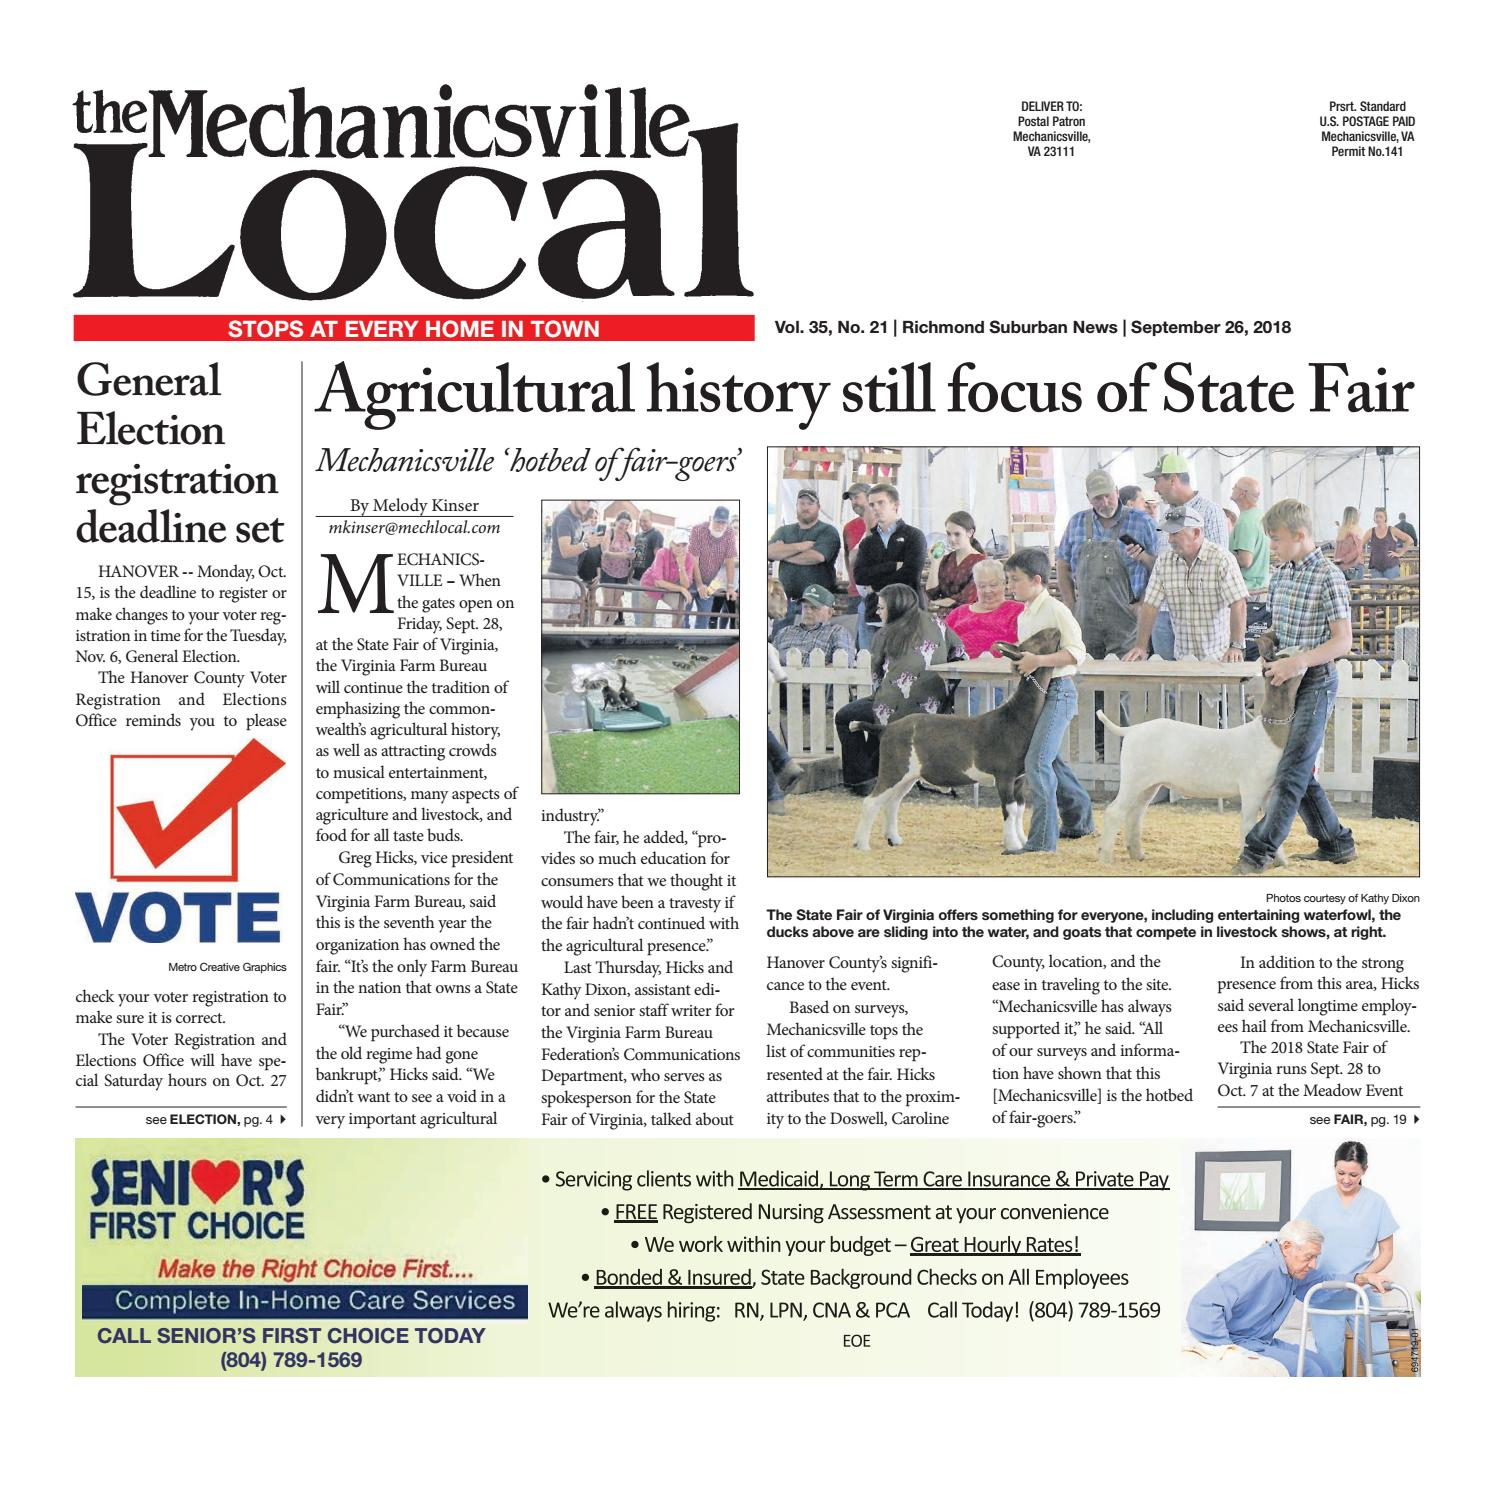 f9aa024049 09 26 18 by The Mechanicsville Local - issuu